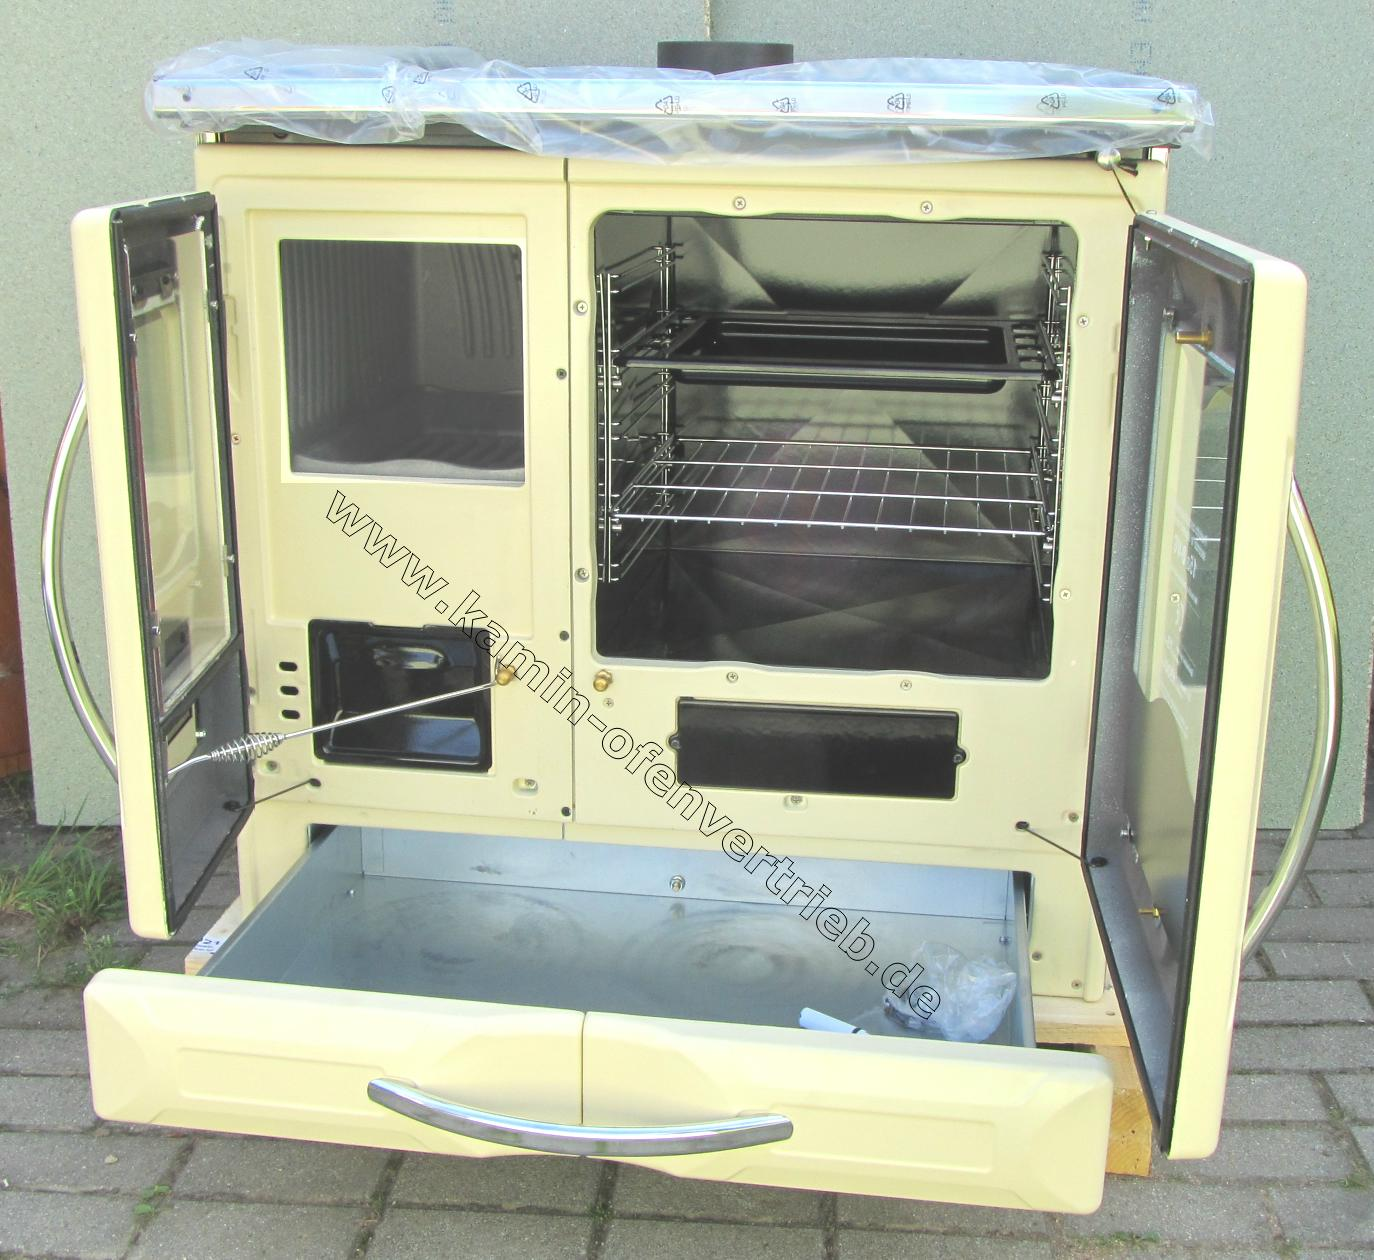 la nordica herd h ndler italy built in america suprema mamy cucinotta rosa xxl reverse. Black Bedroom Furniture Sets. Home Design Ideas